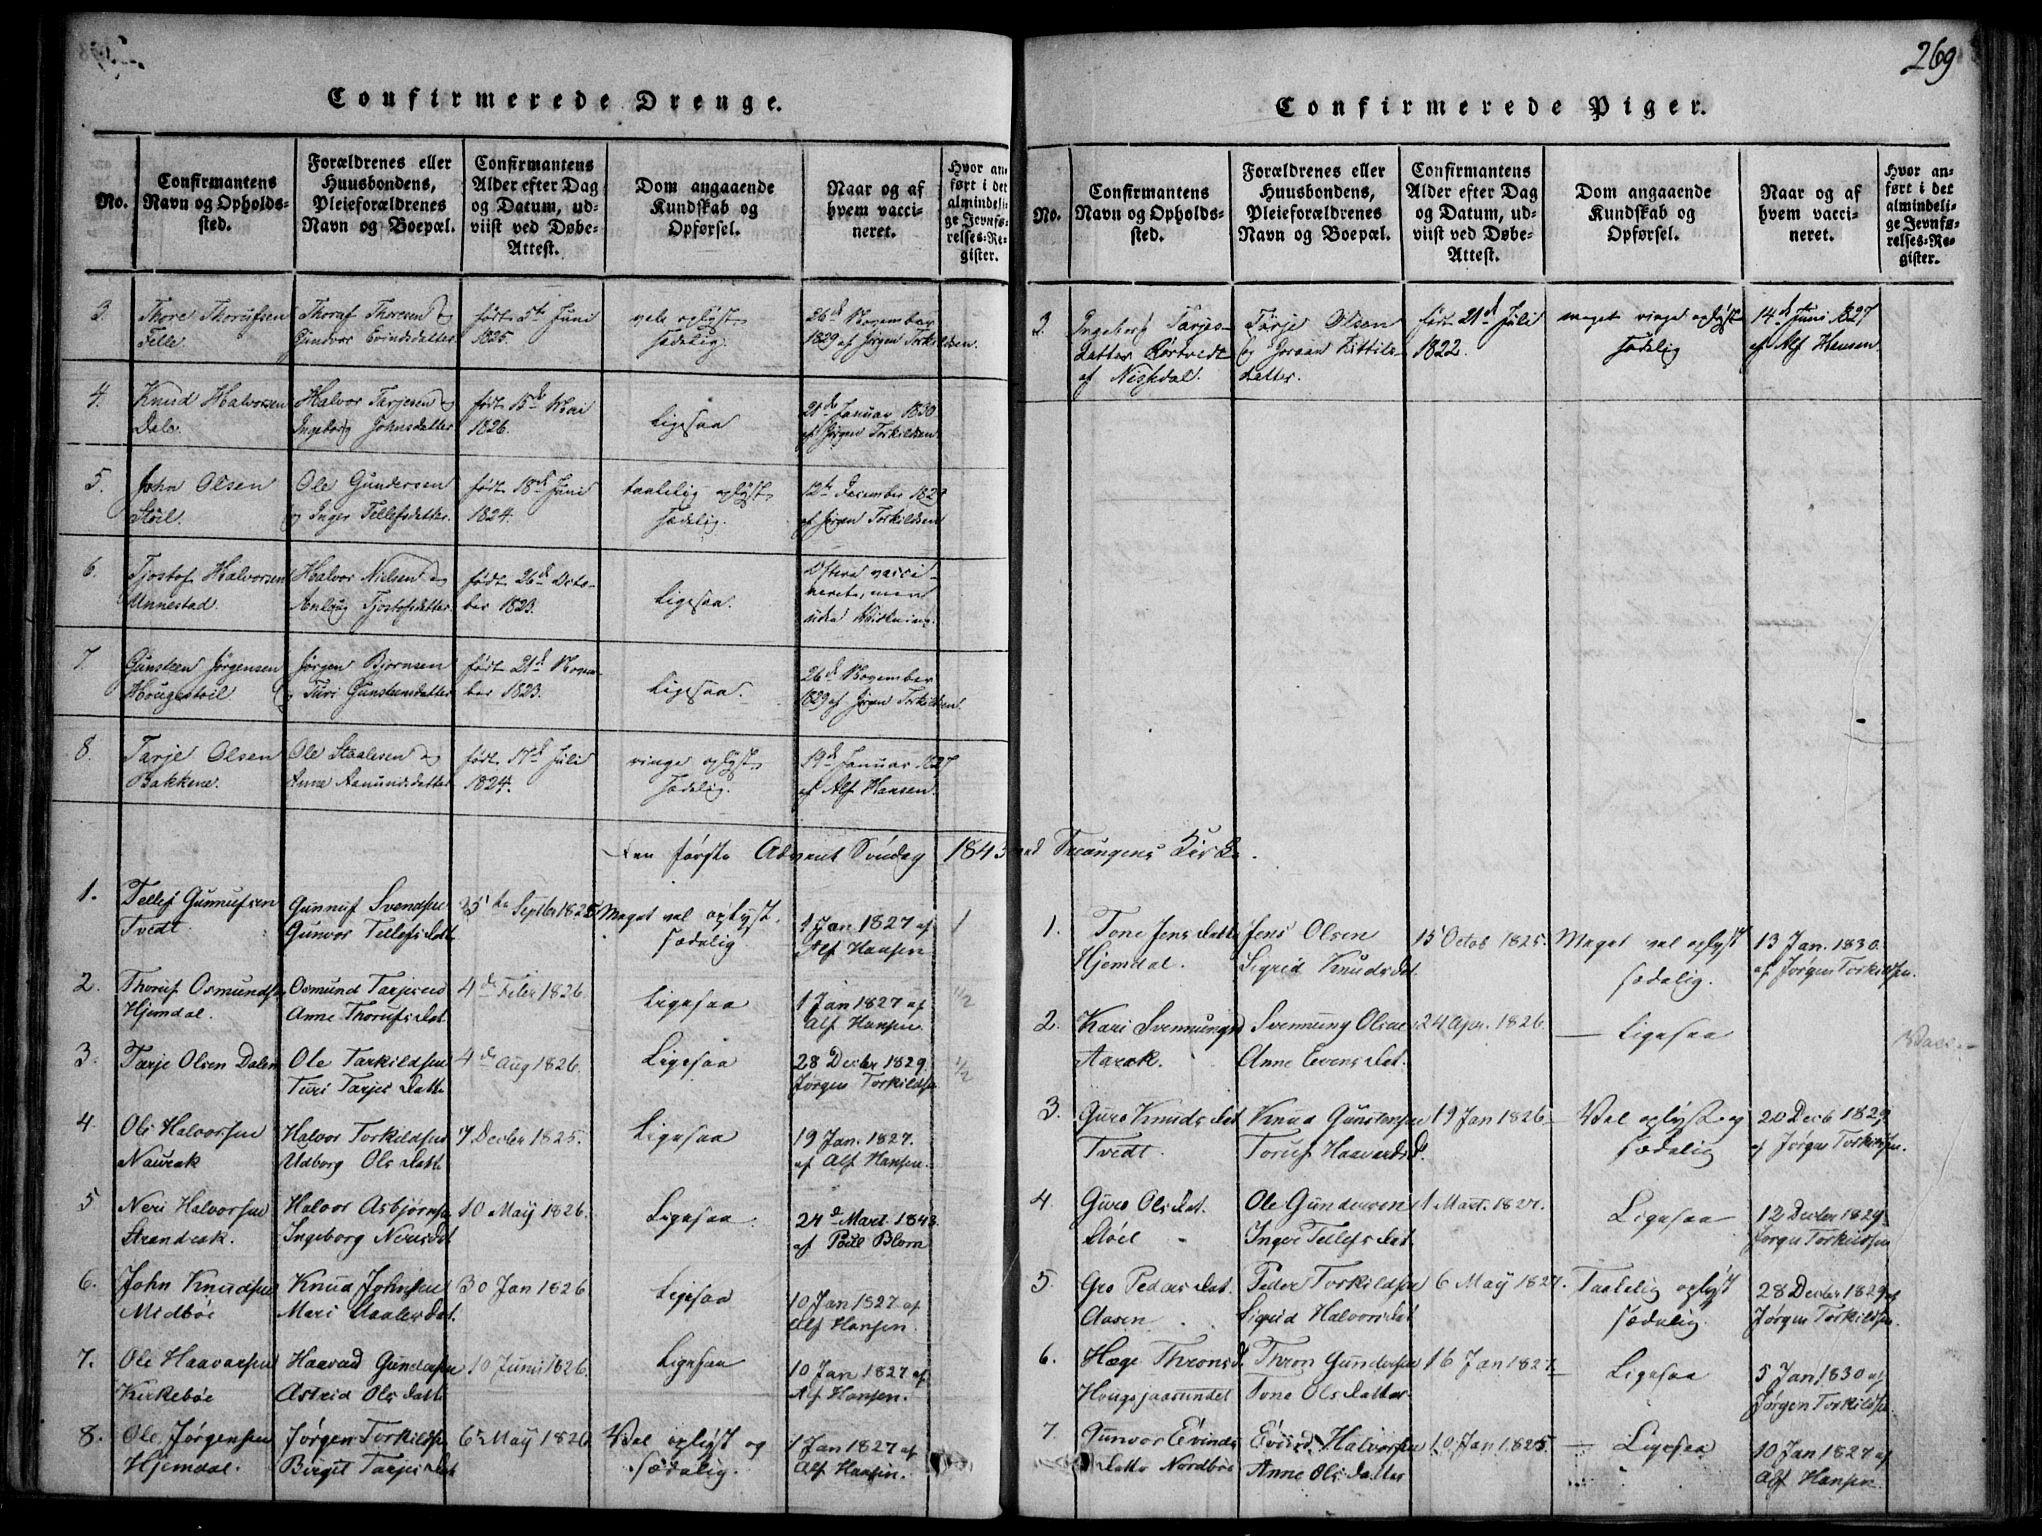 SAKO, Nissedal kirkebøker, F/Fb/L0001: Ministerialbok nr. II 1, 1814-1845, s. 269